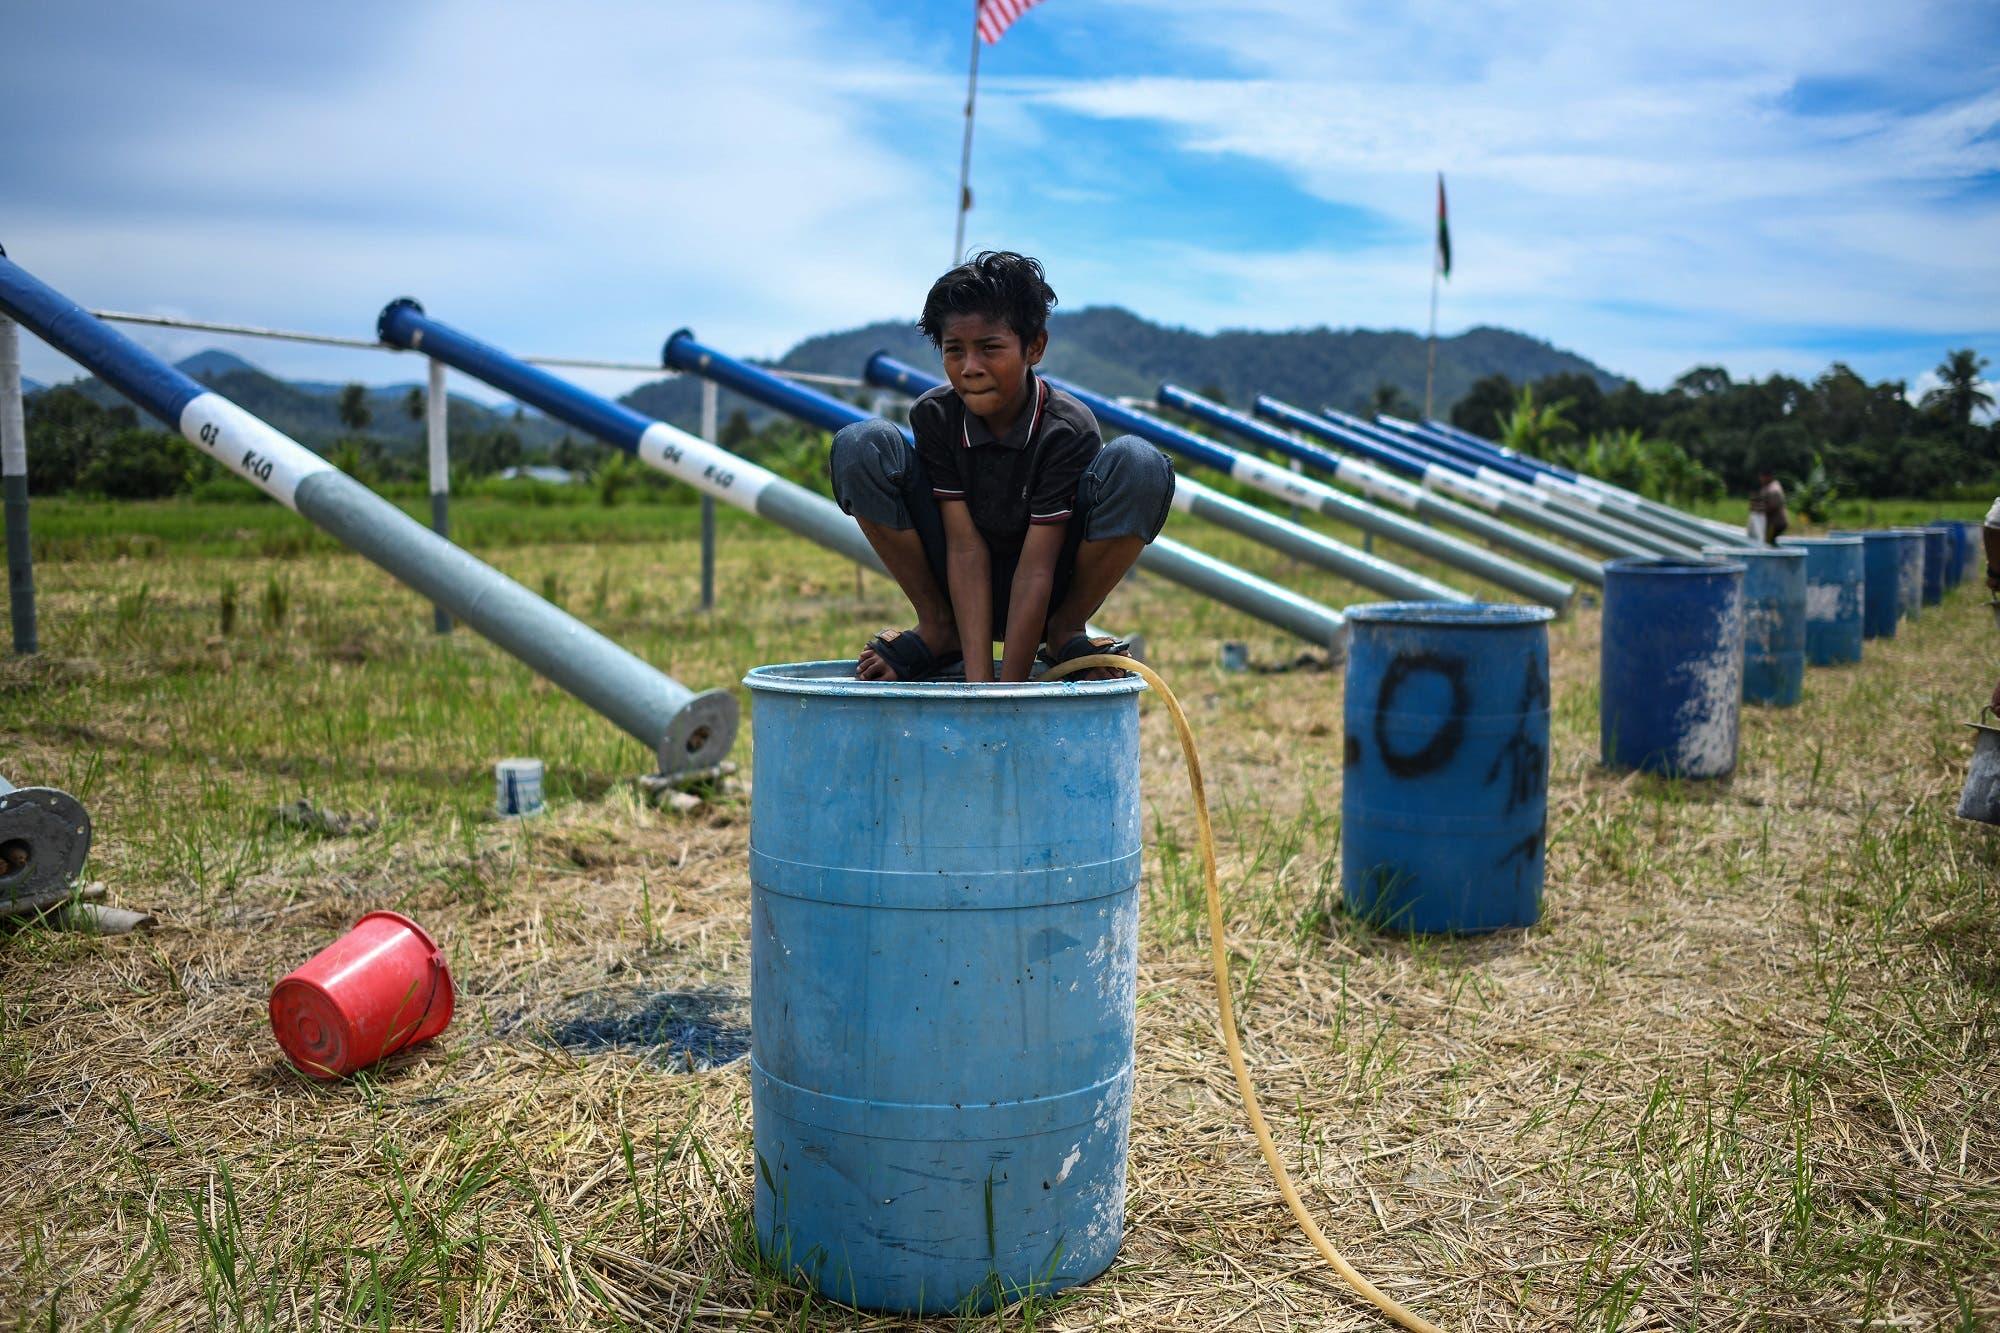 A boy filling water in a drum before firing steel cannons on the eve of Eid al-Fitr in Kuala Kangsar on June 4, 2019. (AFP)